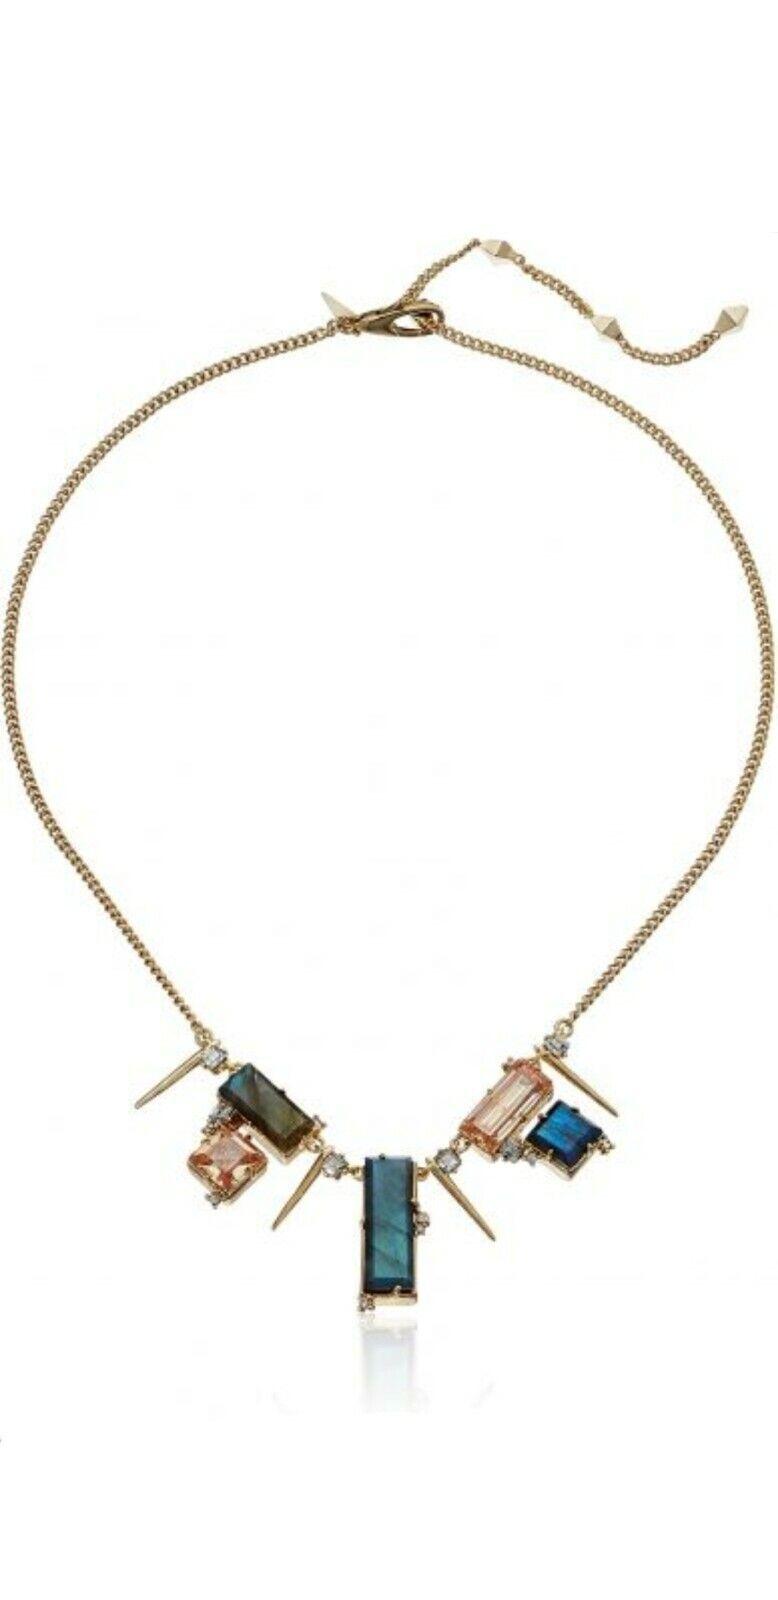 Alexis Bittar 10k Gold Plated Multi-stone Geometric Spike Bib Necklace